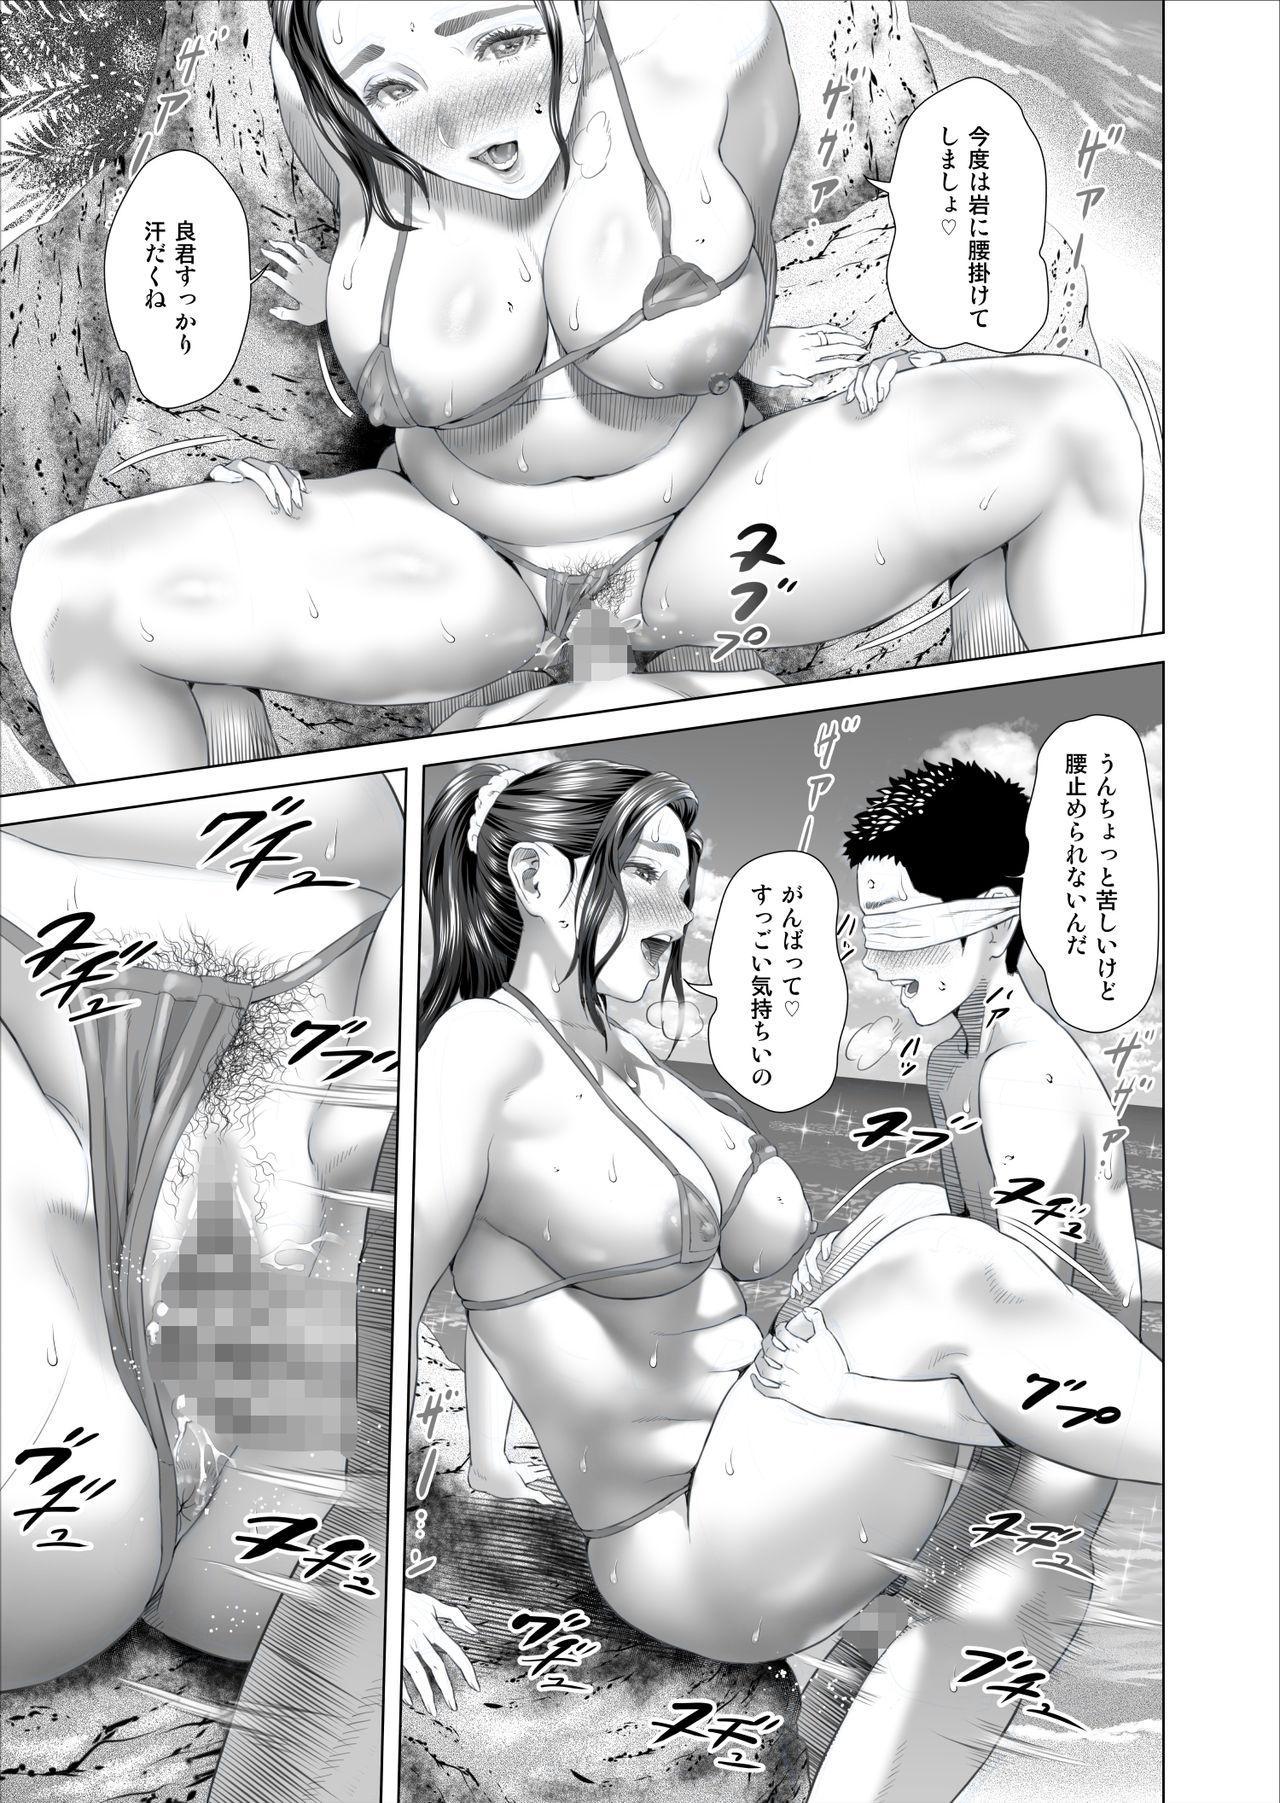 Kinjo Yuuwaku Musuko o Yobai ni Sasou Haha Hen | Neighborhood Seduction Mother Lures Son for a Night Visit! 194